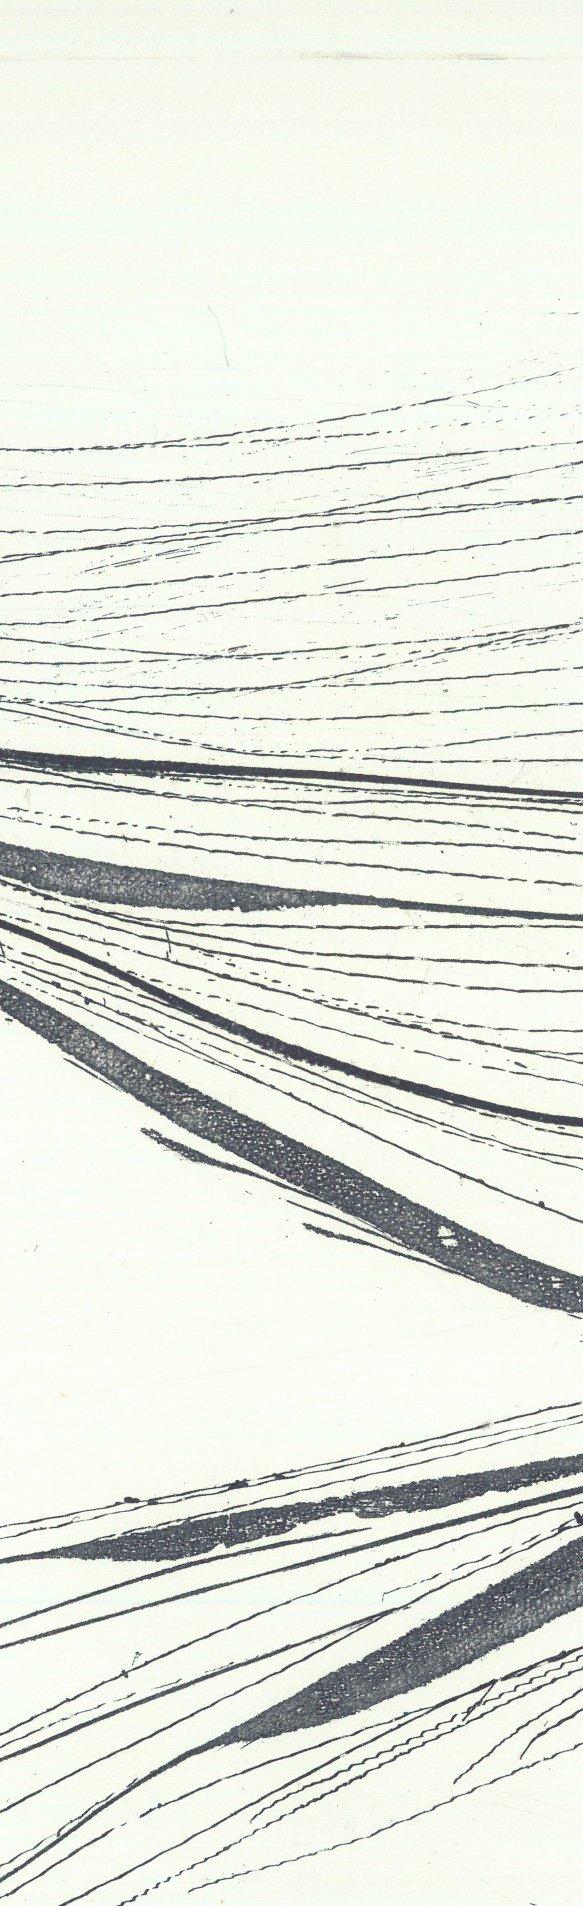 Luce lunare – p.d.a. 13 – Bruscaglia 1980_ritaglio